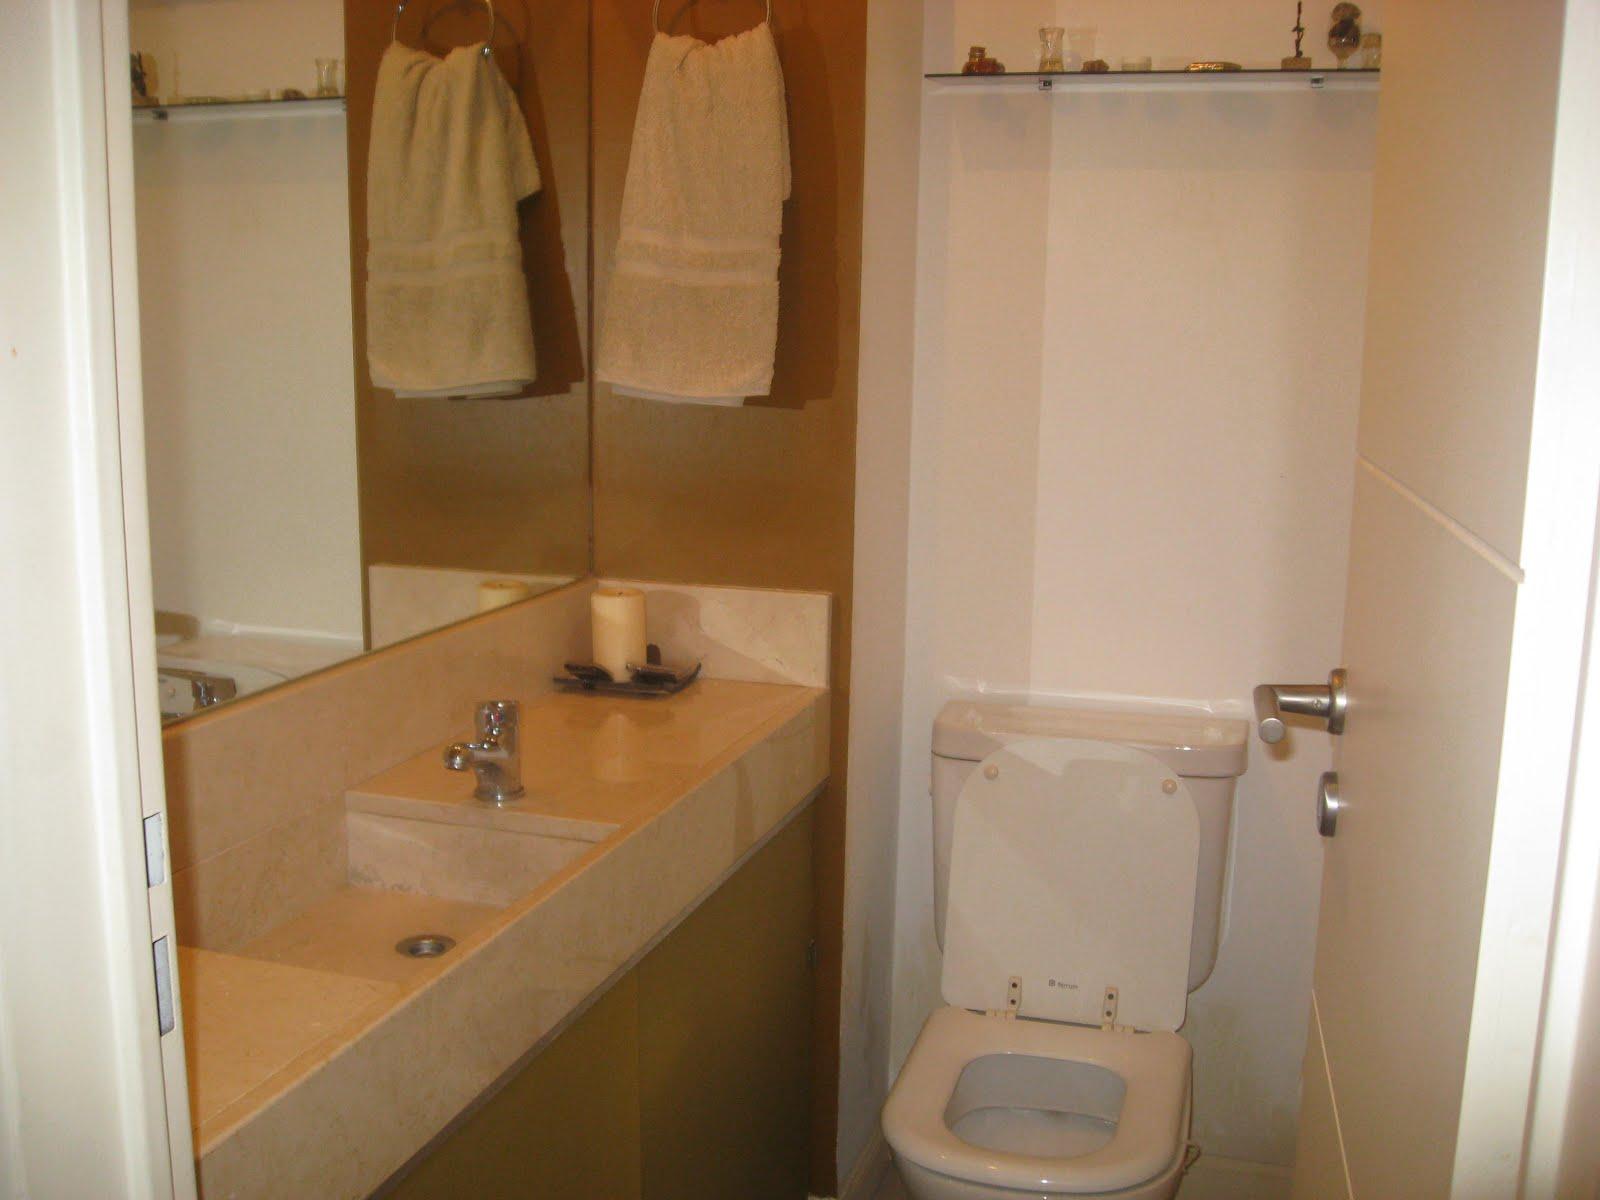 Cmo disear el toilette  Hoydecoracioncom